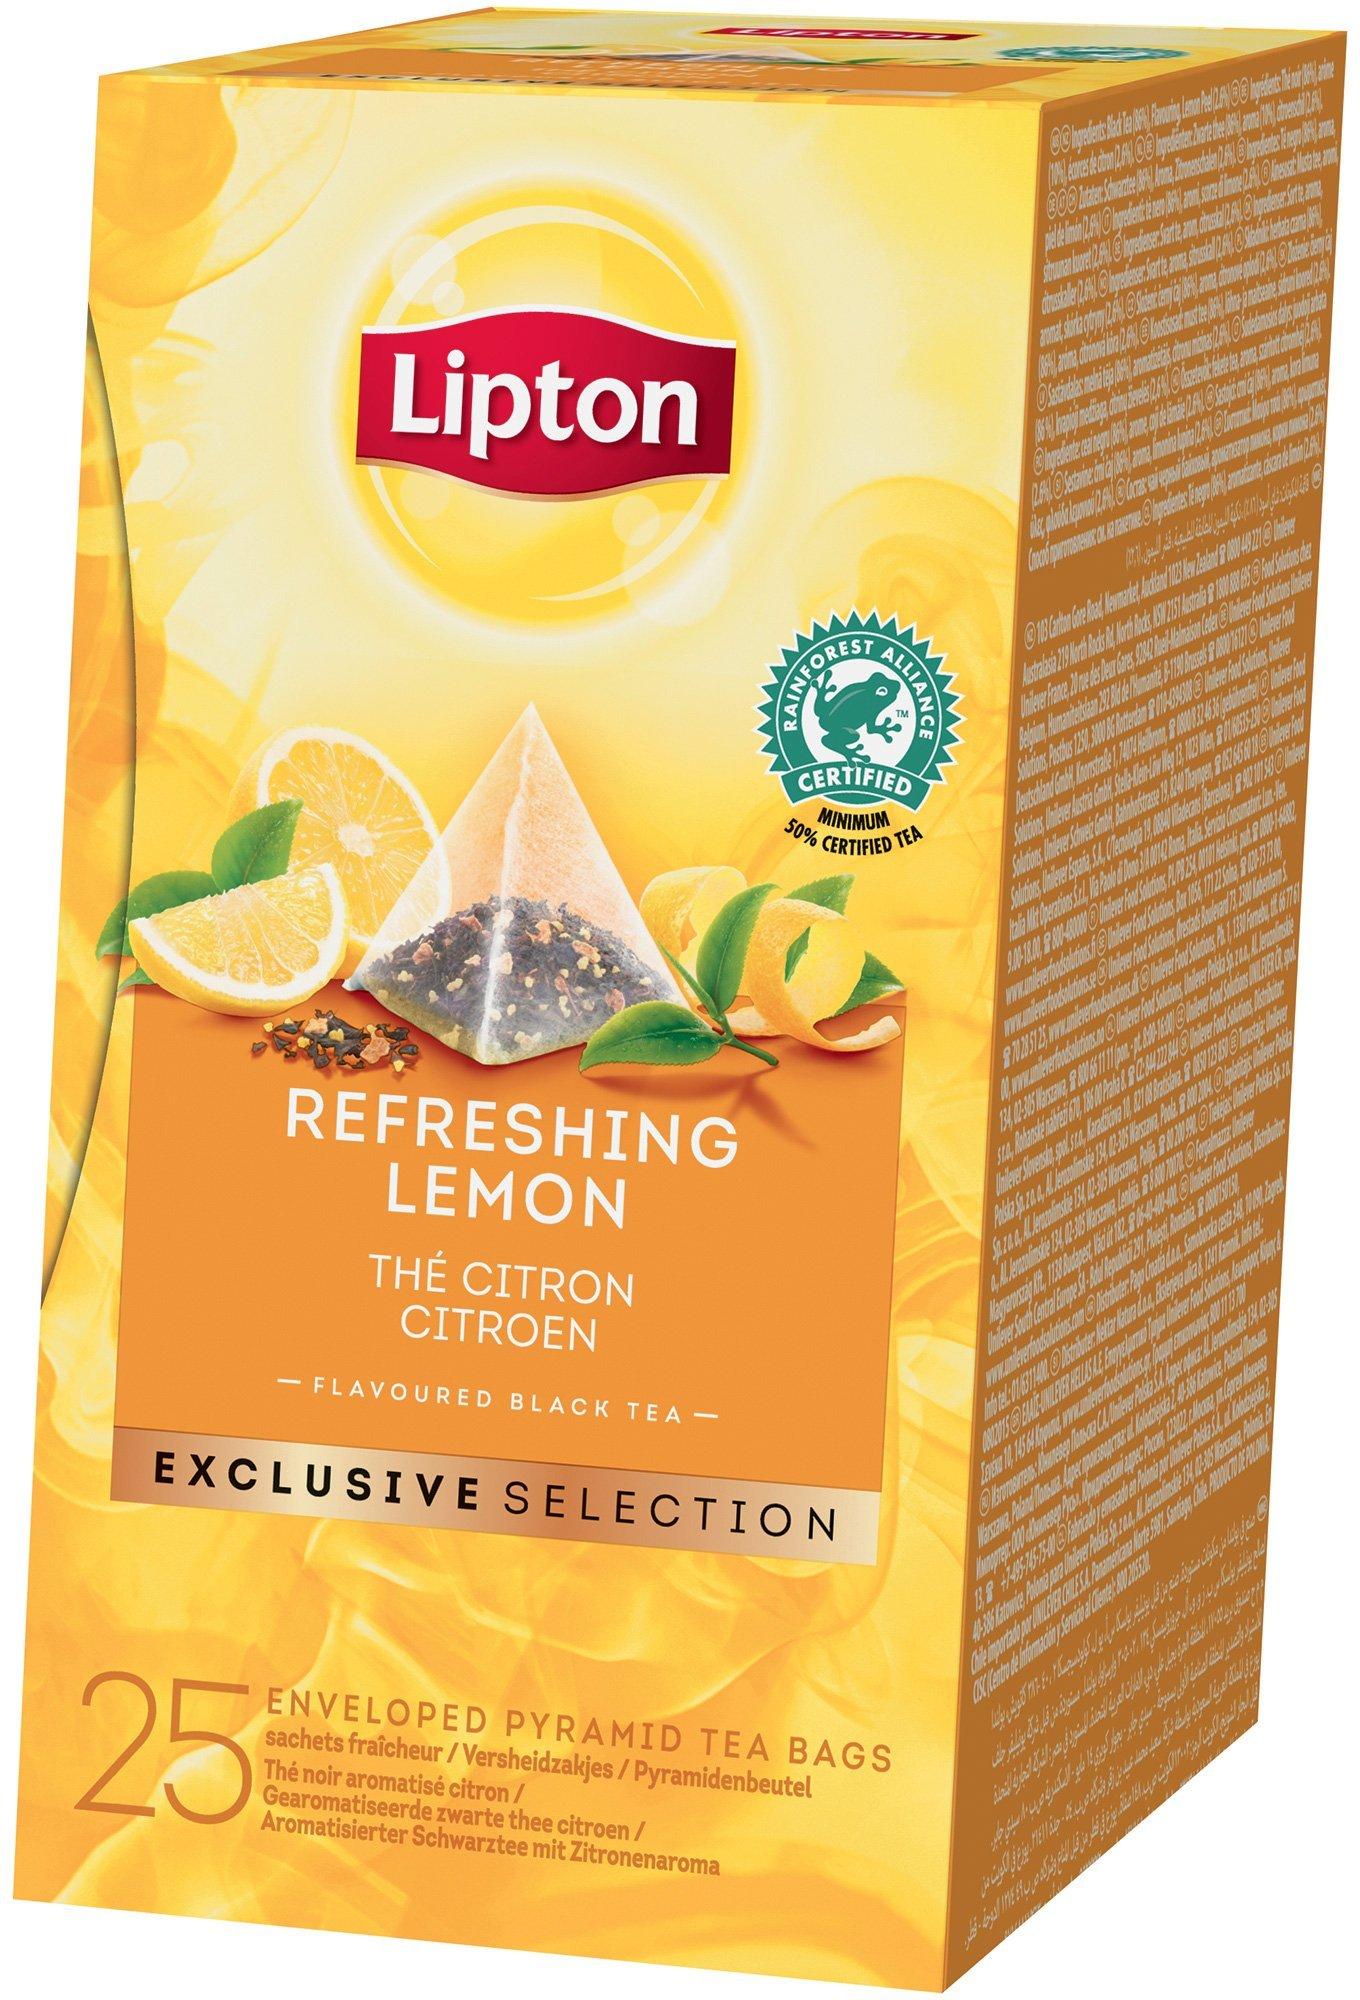 Lipton Pyramid Refreshing Lemon Flavoured Black Tea 25 Filtri